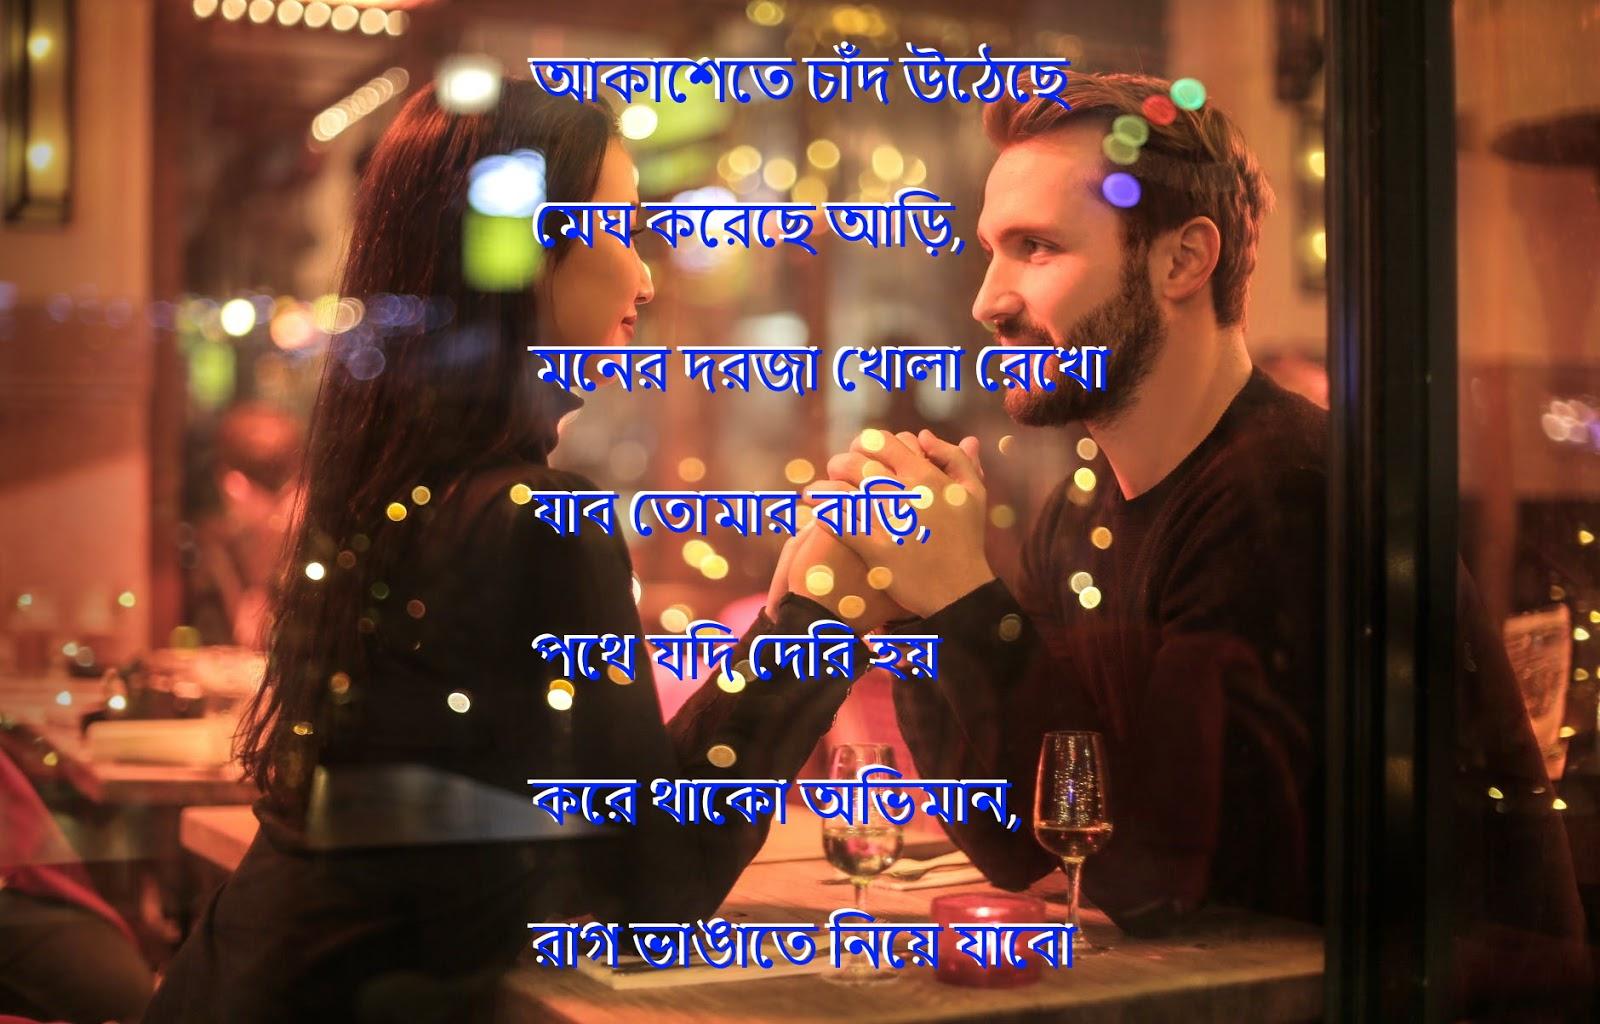 Bengali Shayari romantic bangla love sms ভালোবাসার রোমান্টিক এসএমএস ও কবিতা